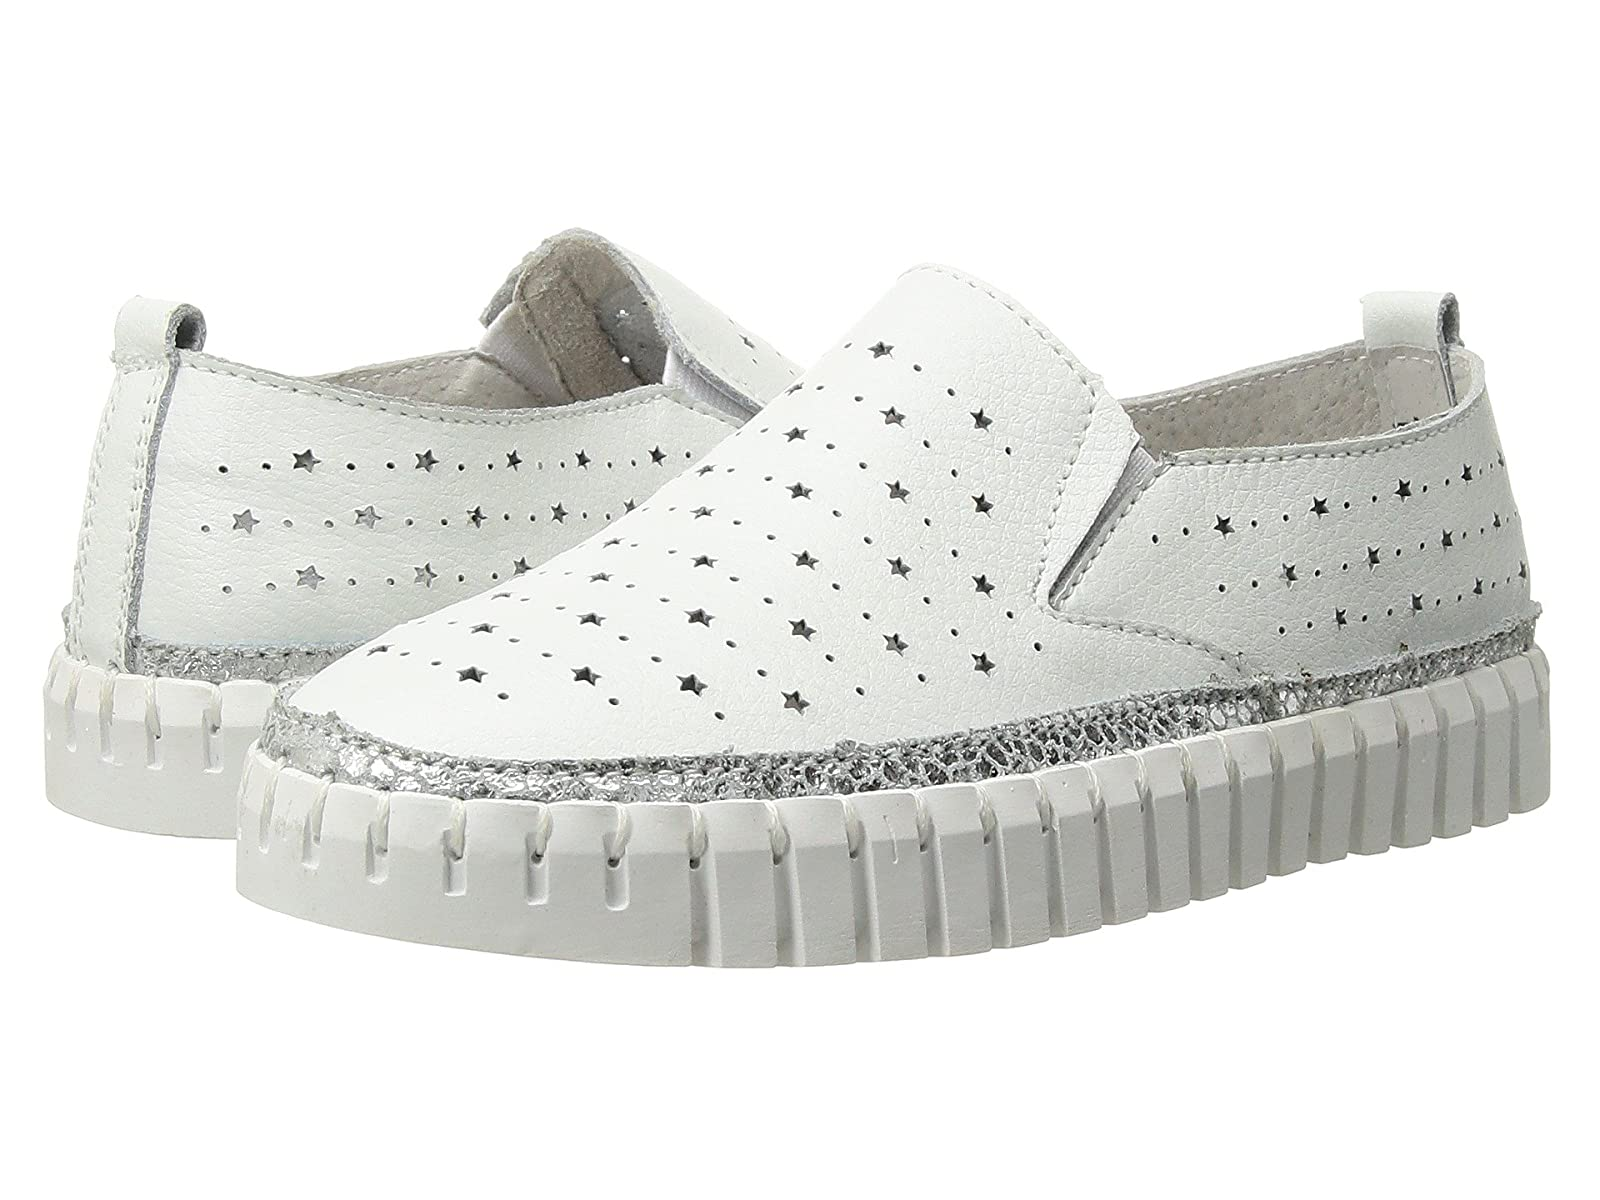 bernie mev. Kids Twk40 (Little Kid/Big Kid)Atmospheric grades have affordable shoes